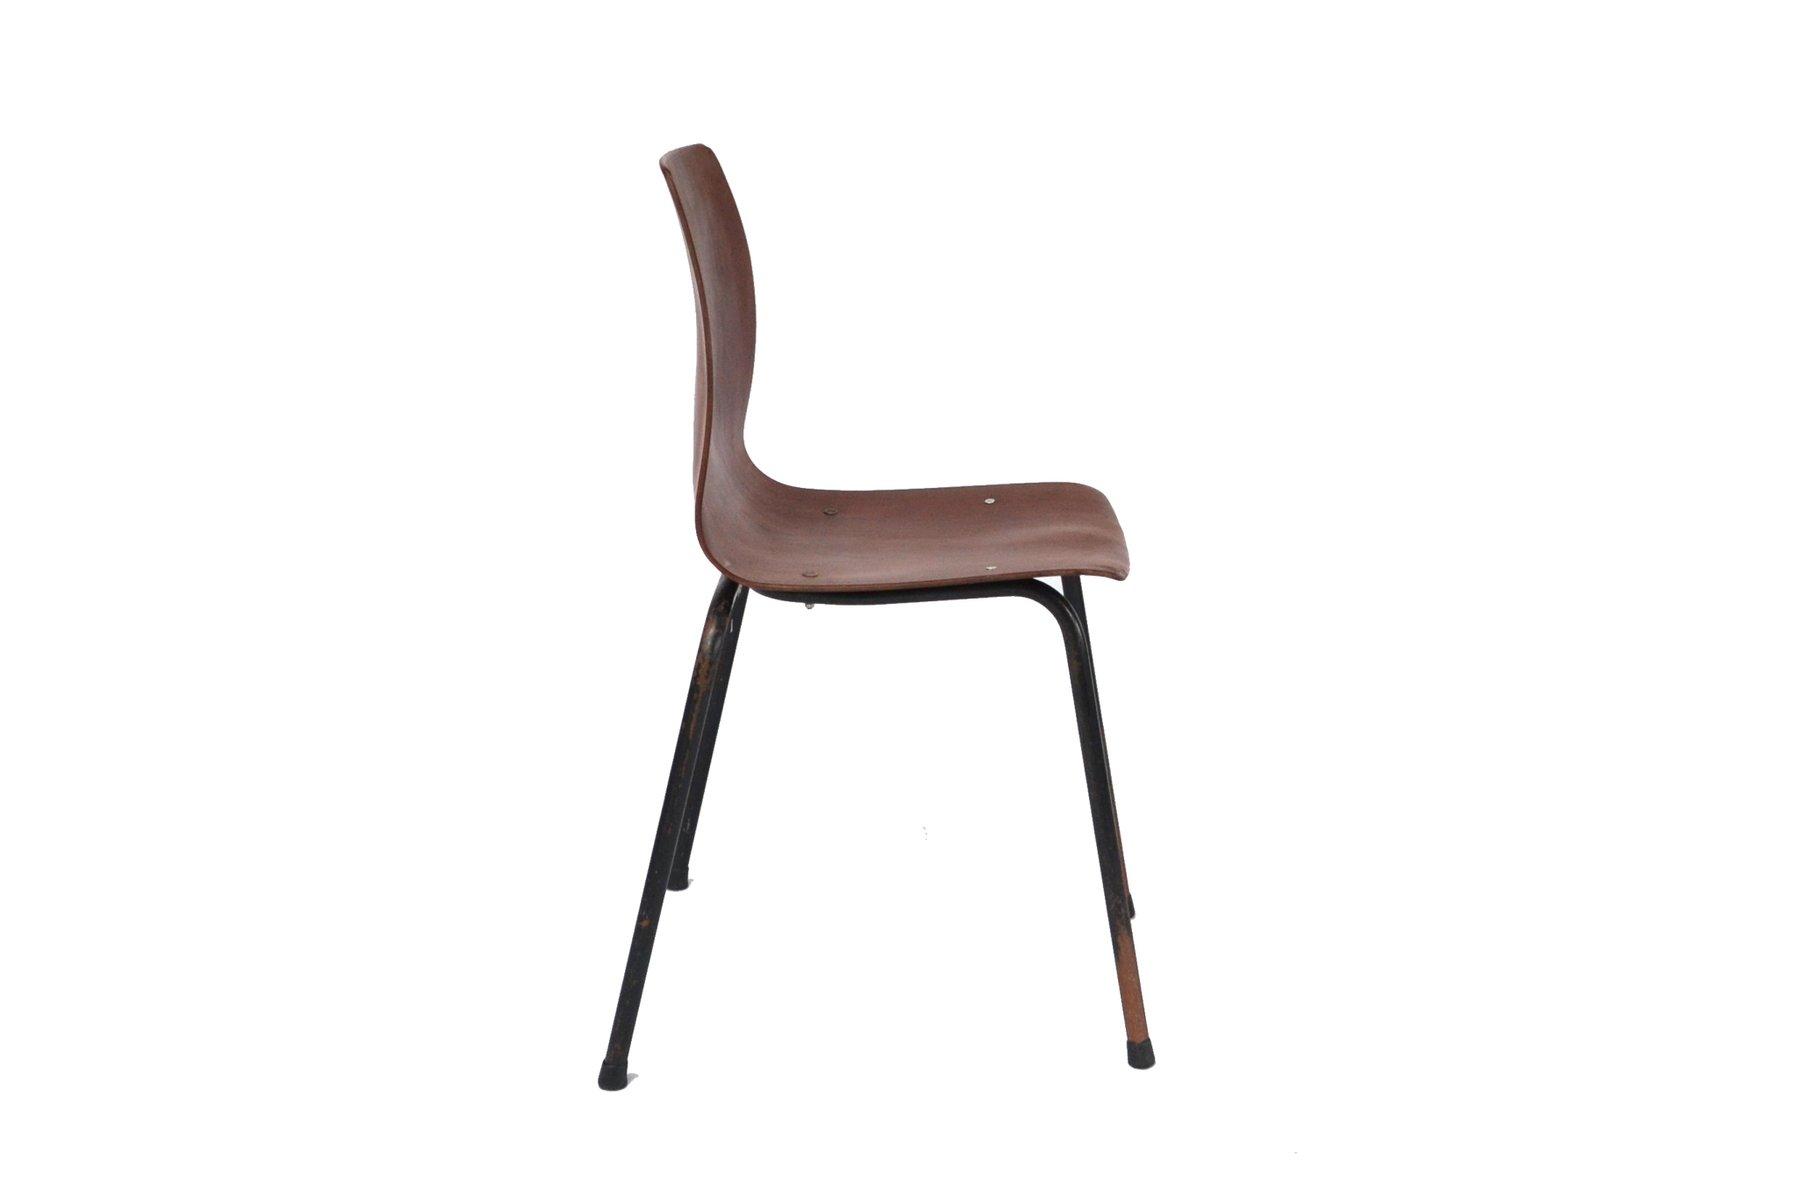 mid century stuhl von pagholz fl totto bei pamono kaufen. Black Bedroom Furniture Sets. Home Design Ideas